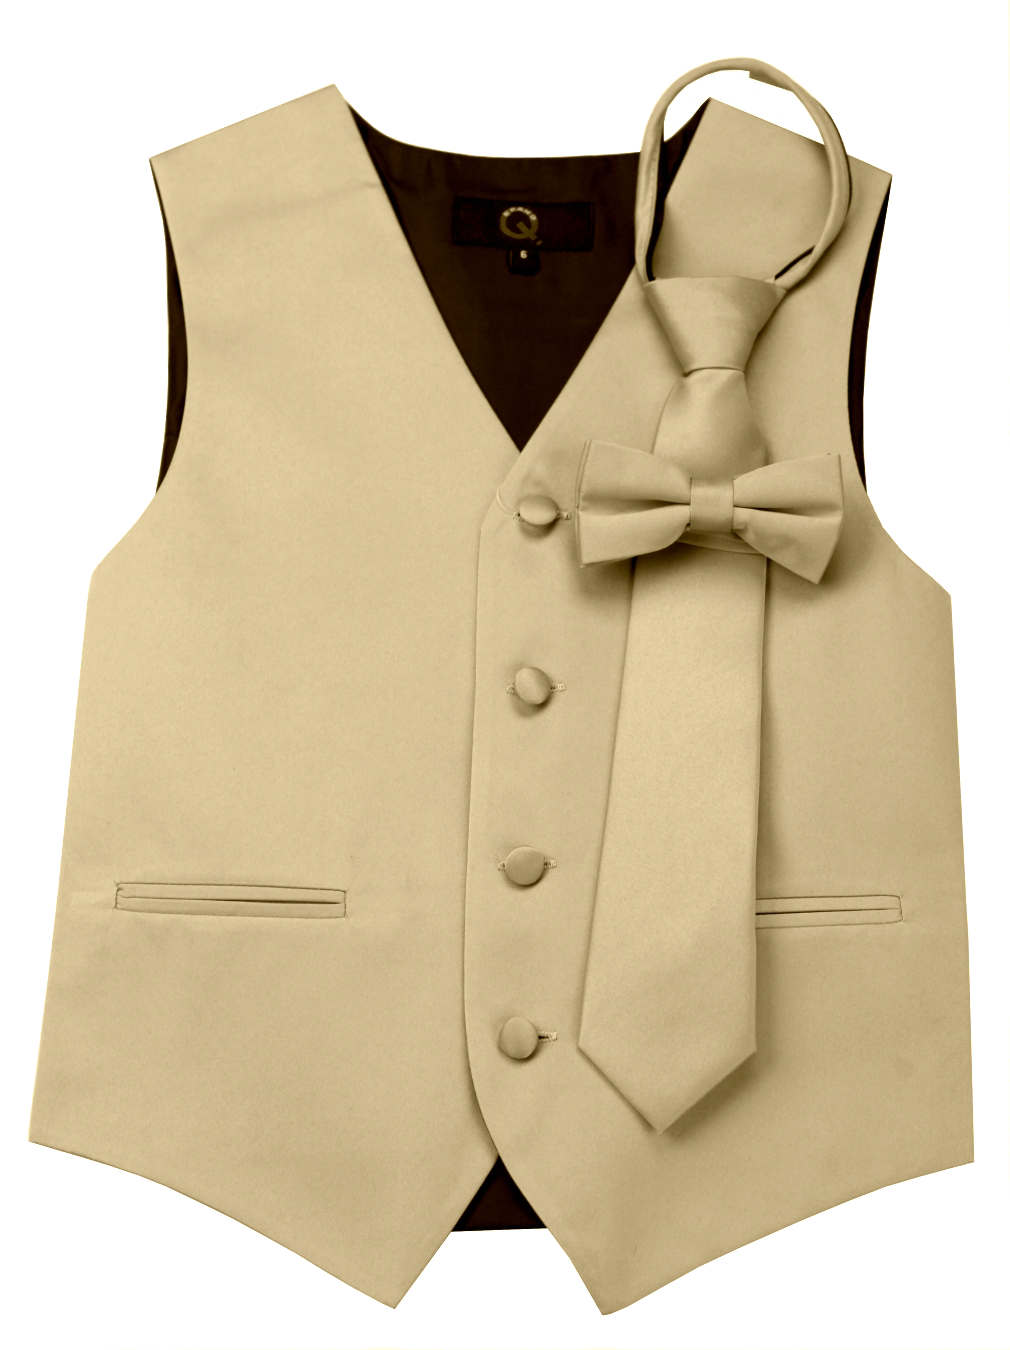 Italian Design, Boy's Tuxedo Vest, Zipper Tie & Bow-Tie Set - Champagne